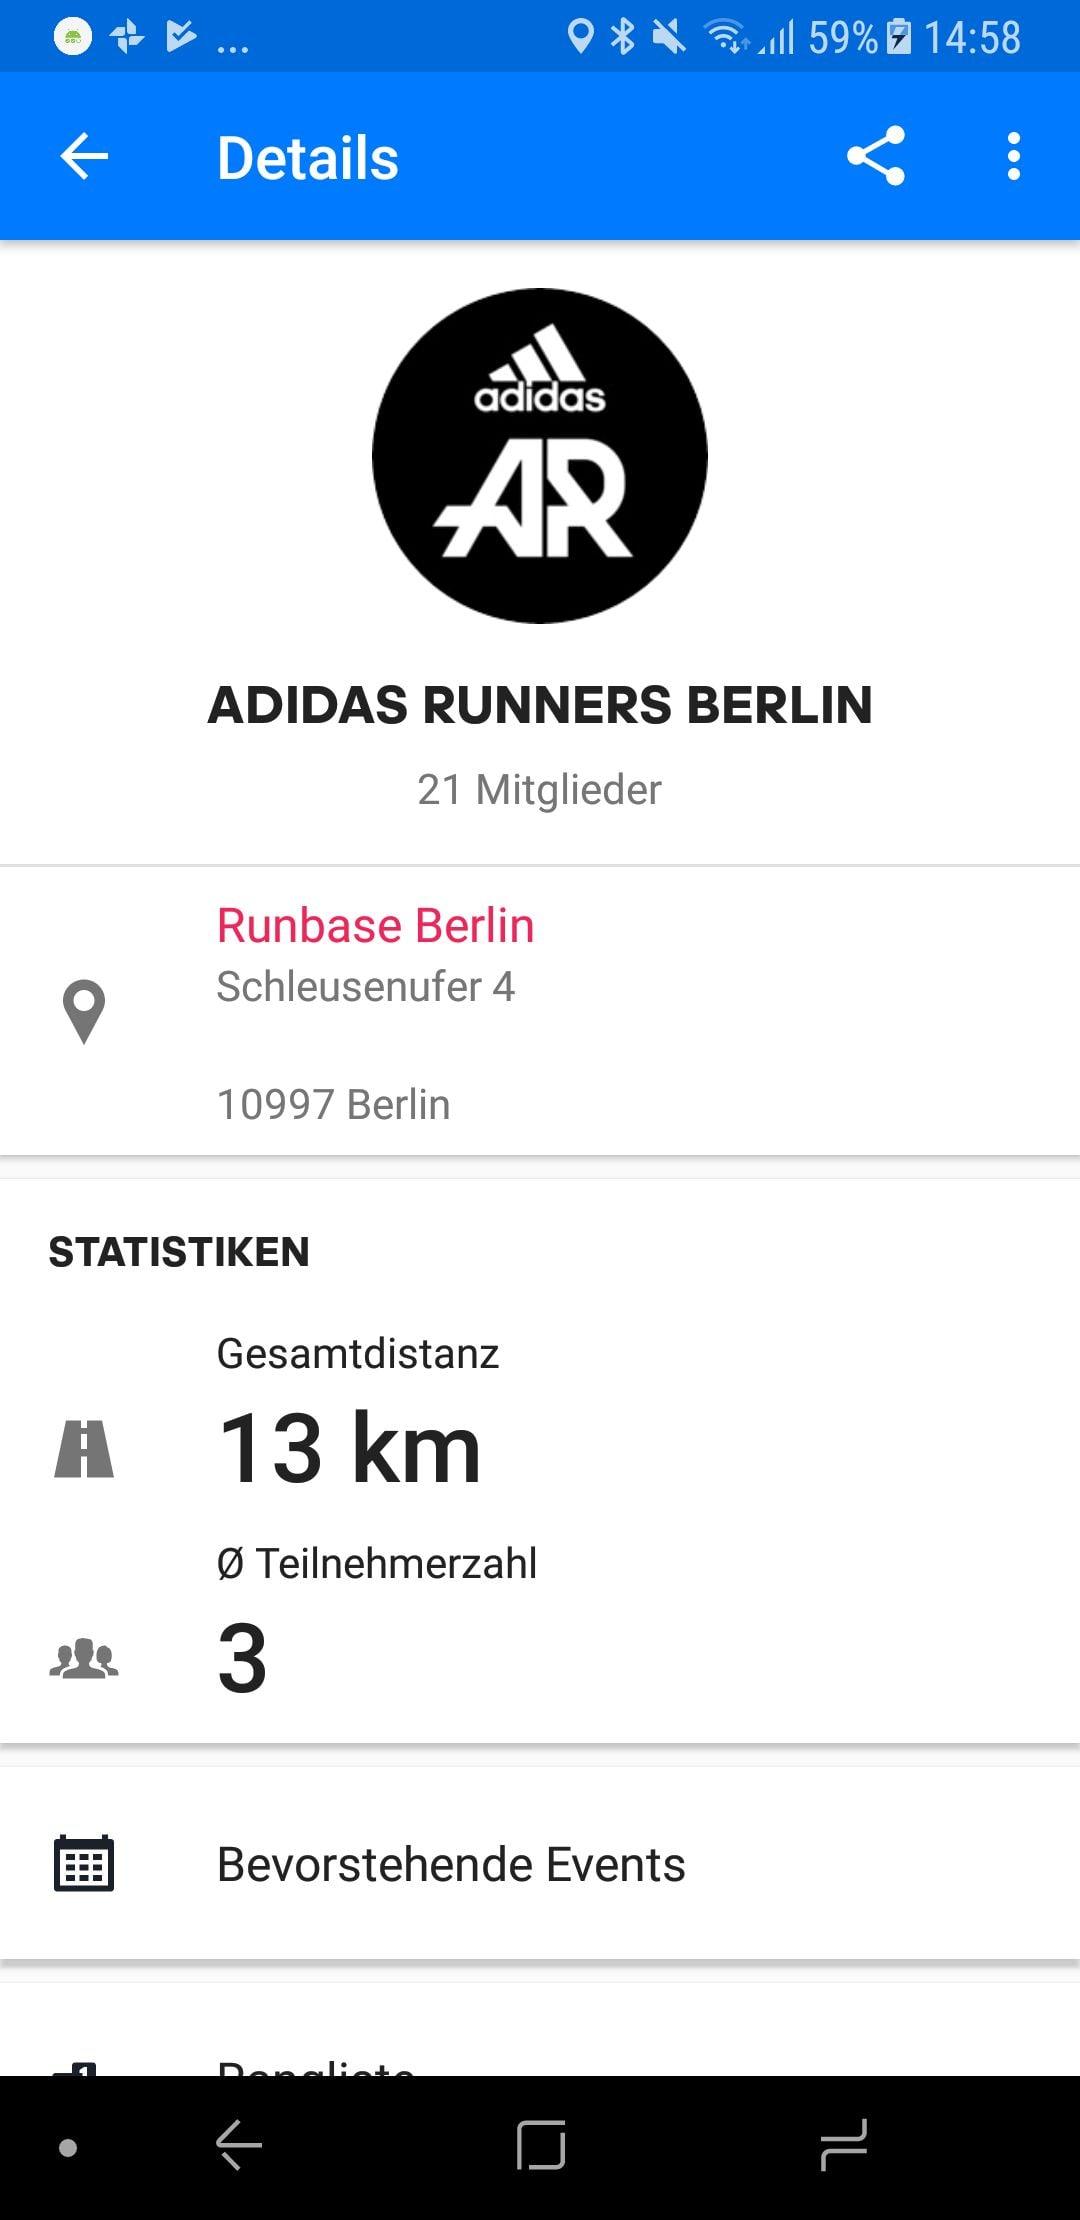 adidas Runners Community Details Runtastic App